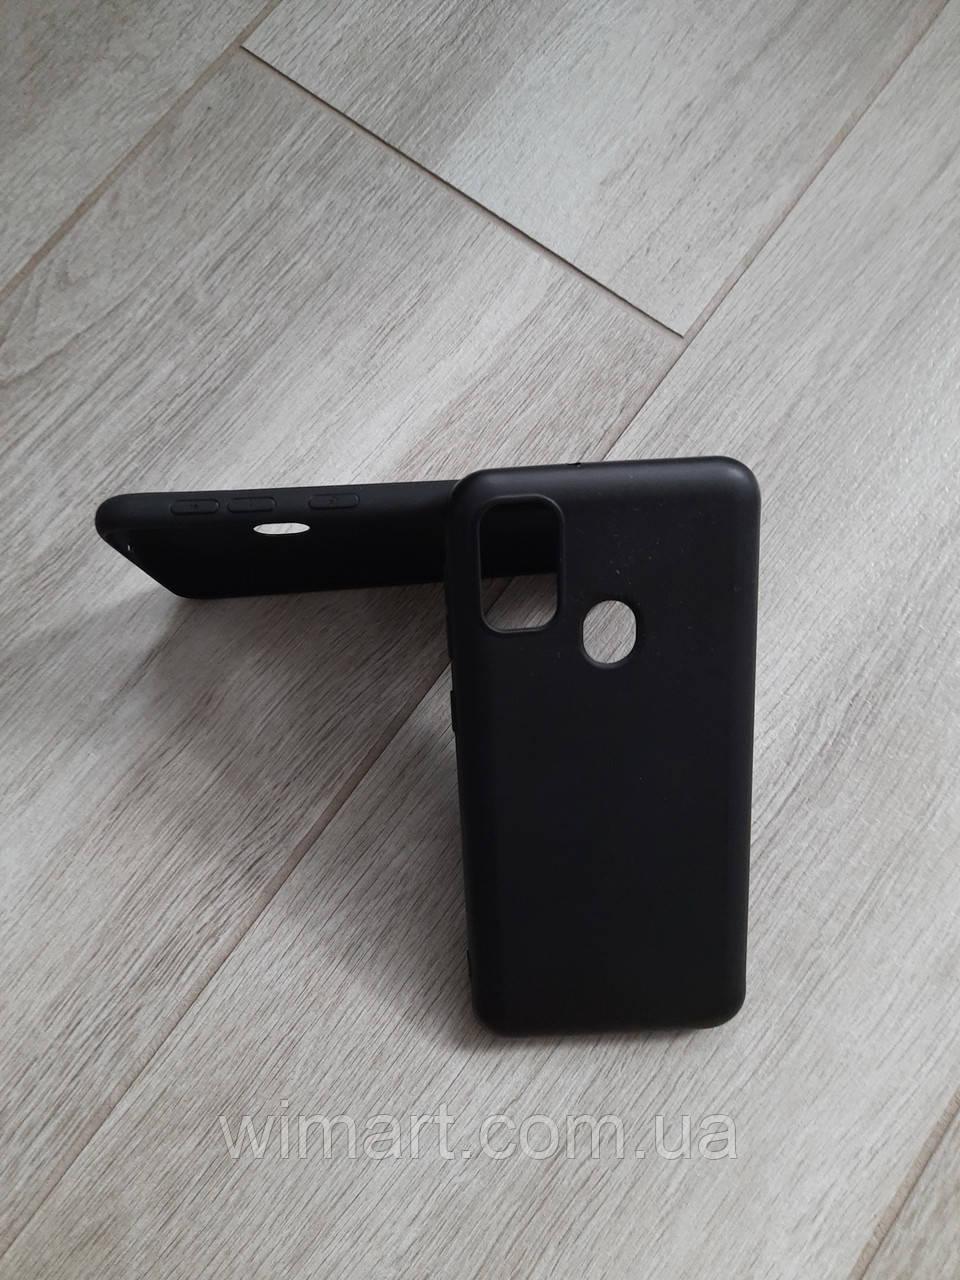 Чехол Samsung Galaxy M31 (SM-M315) / Galaxy M30S (SM-M307).